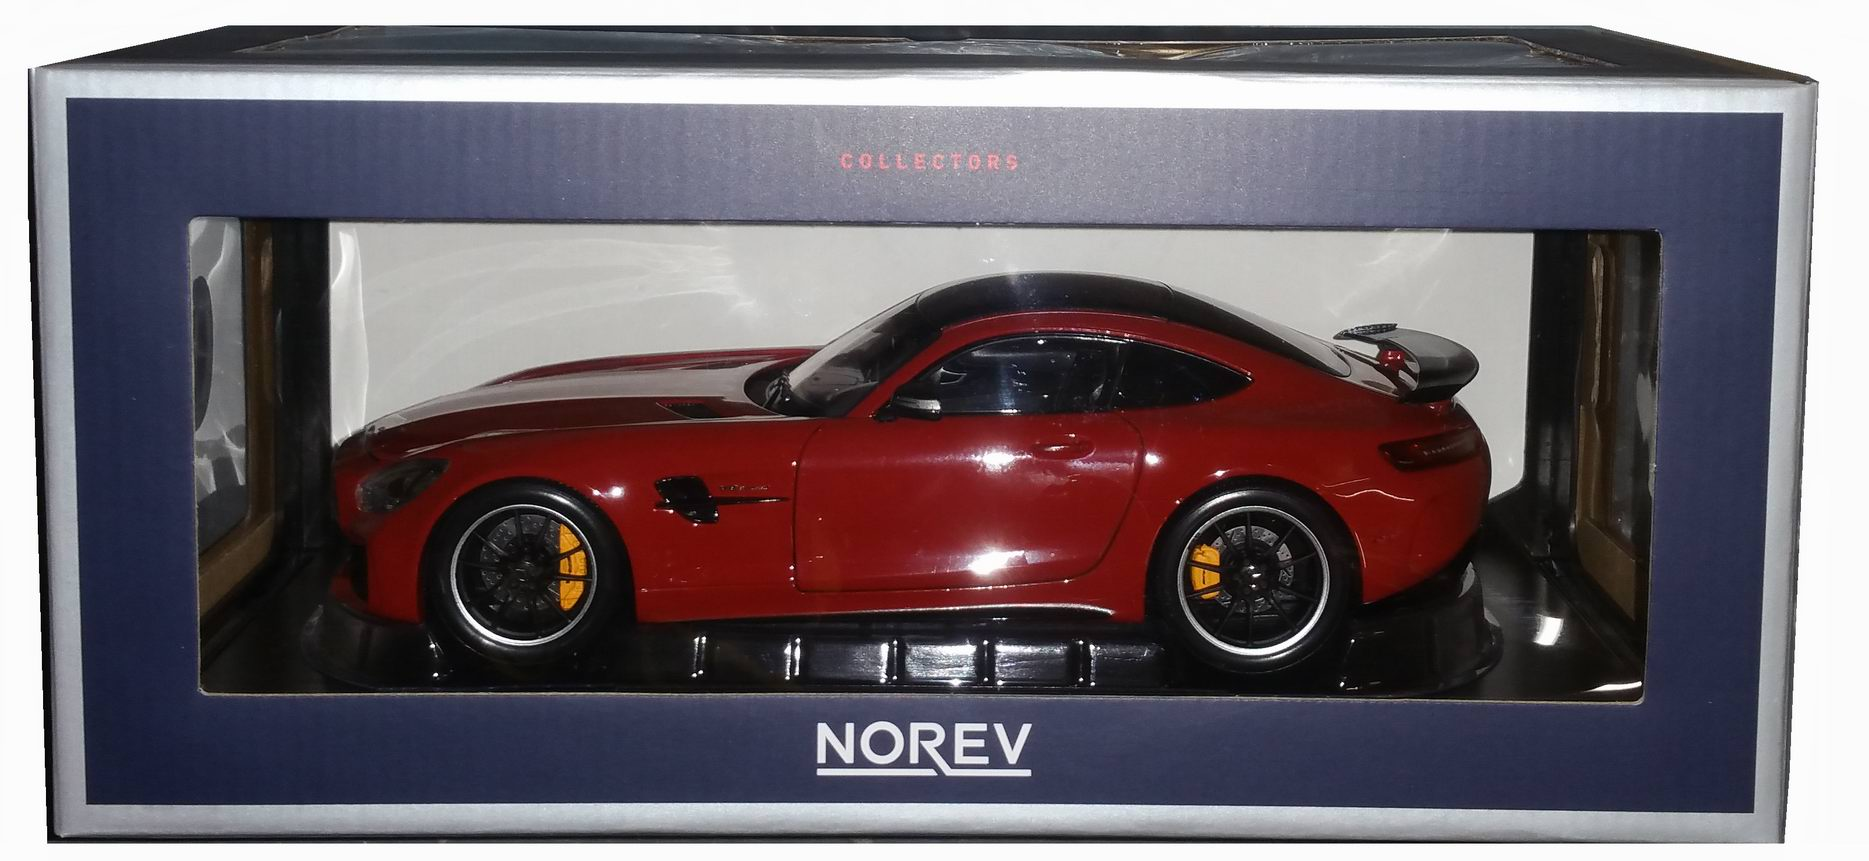 miniatures autos 1 18 norev mercedes benz mercedes. Black Bedroom Furniture Sets. Home Design Ideas